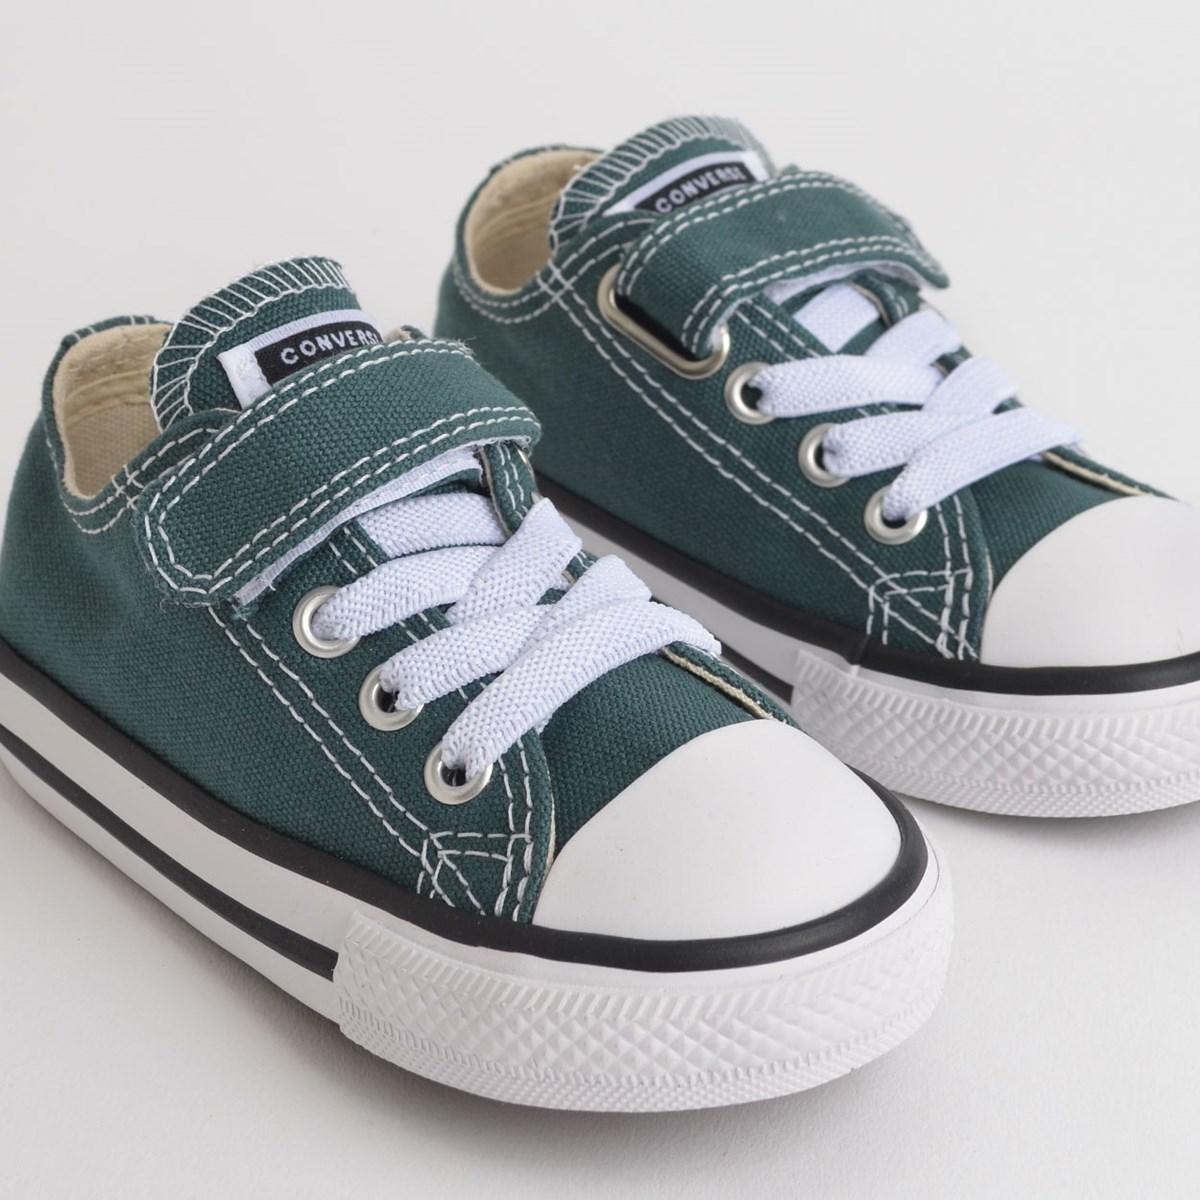 Tênis Converse Chuck Taylor All Star 1V Kids Ox Verde Escuro Preto CK08150003